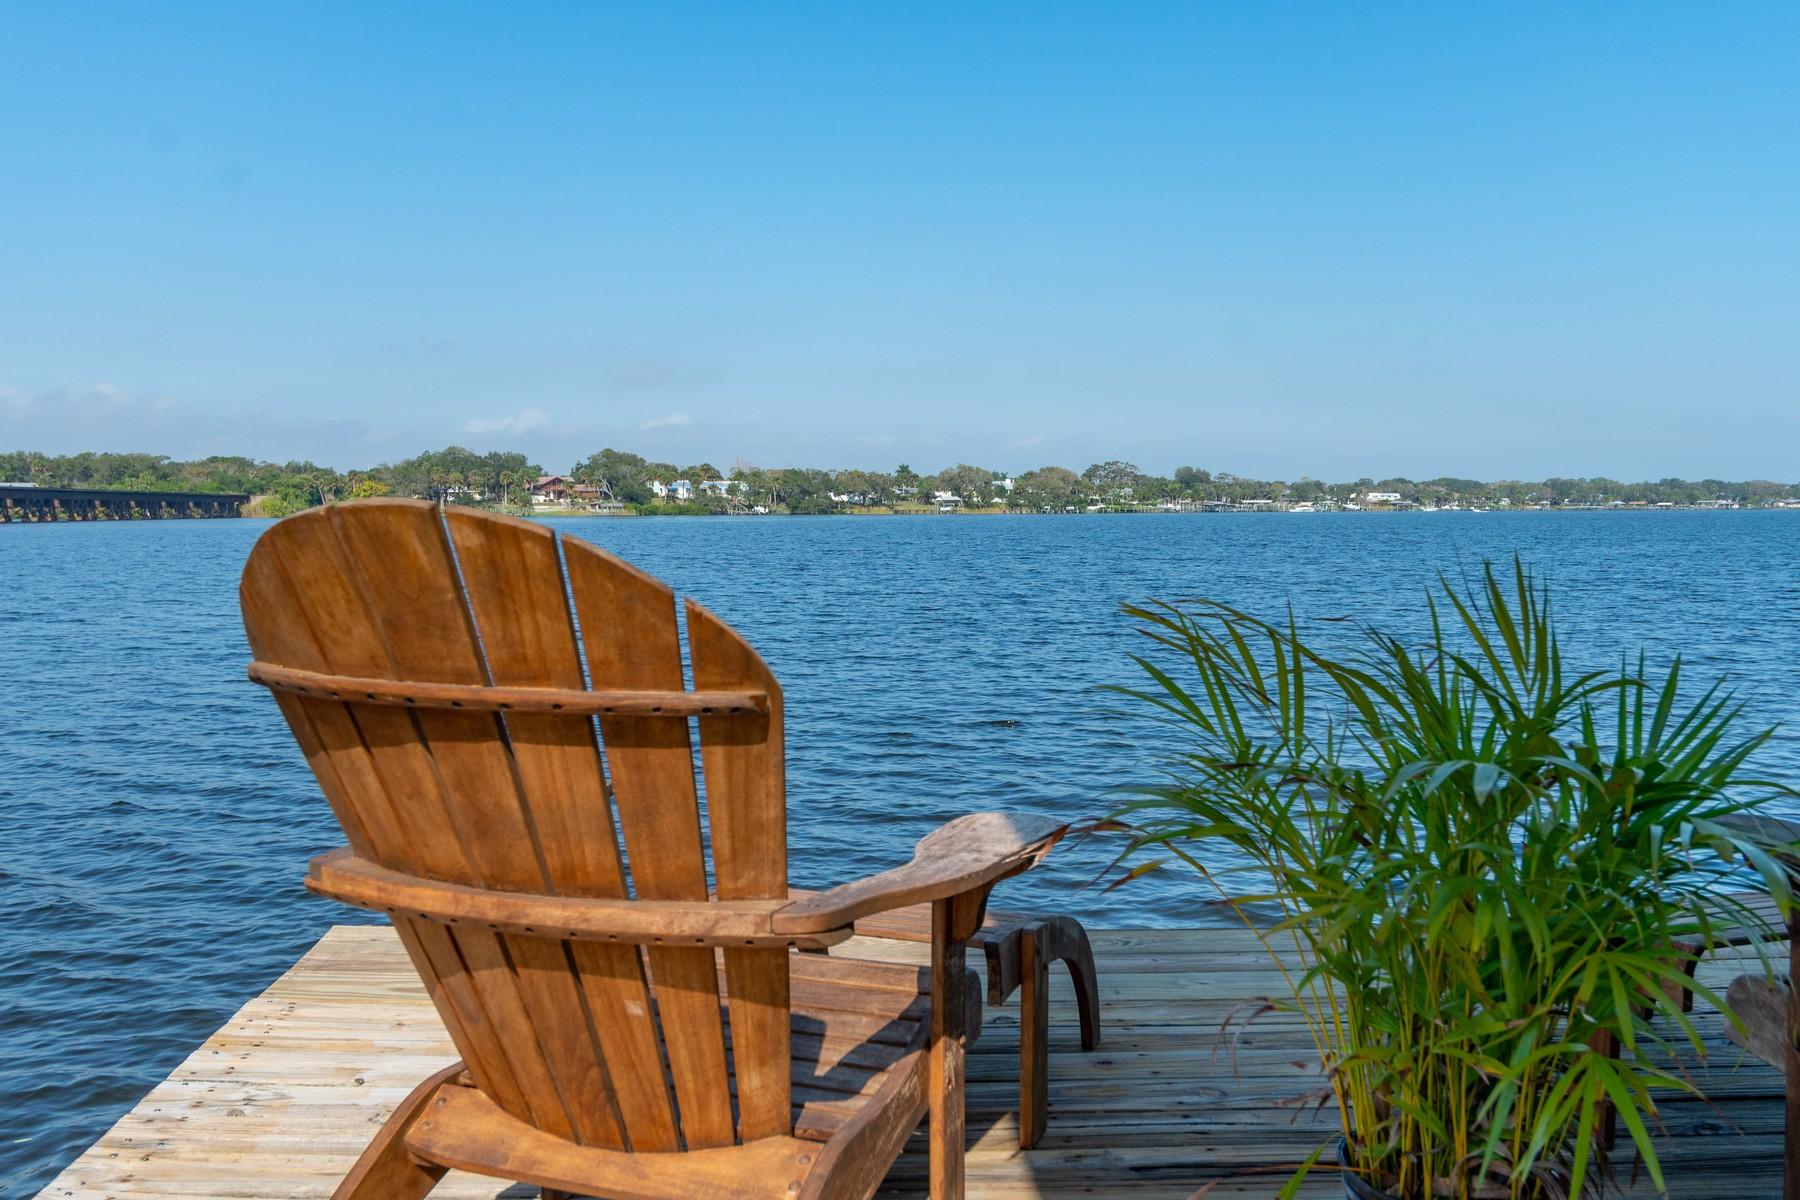 Single Family Homes for Sale at Boater's Paradise! 13315 83rd Avenue Sebastian, Florida 32958 United States